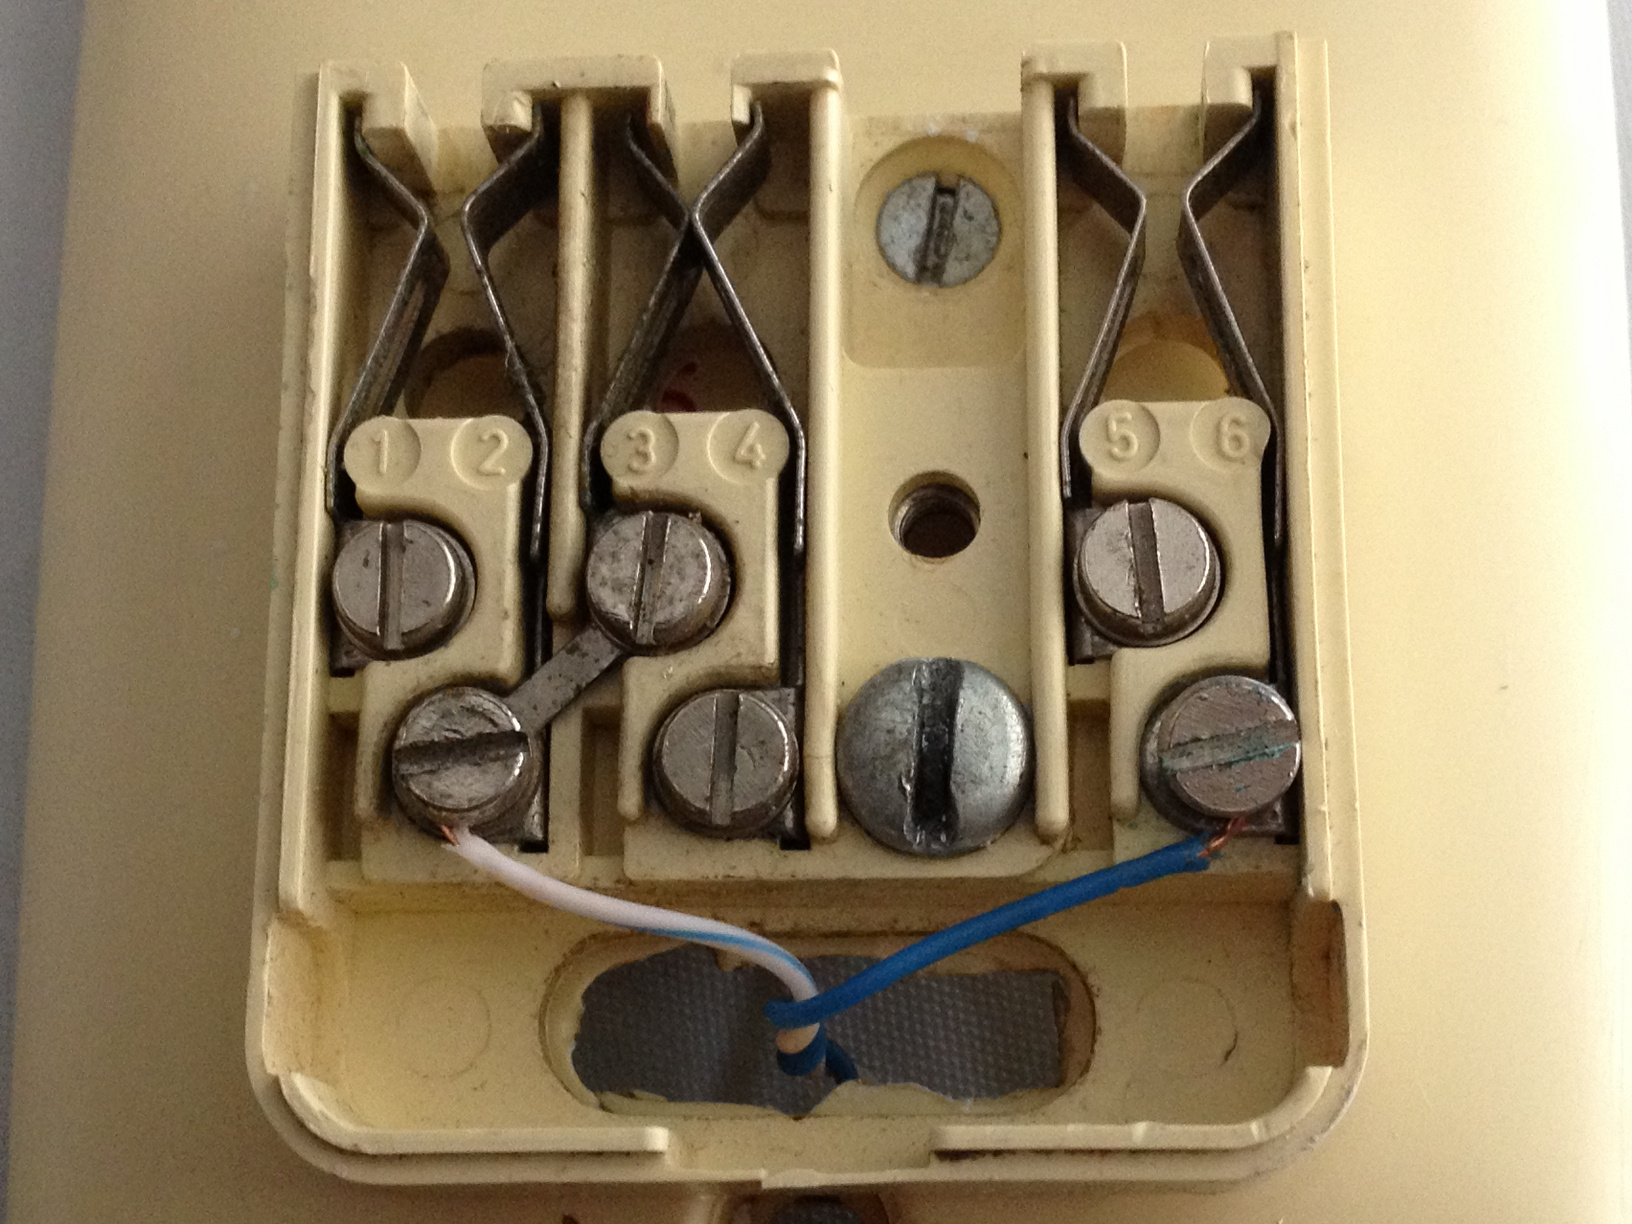 rj wiring color code australia today wiring diagram two line telephone wiring rj wiring diagram australia  [ 1632 x 1224 Pixel ]